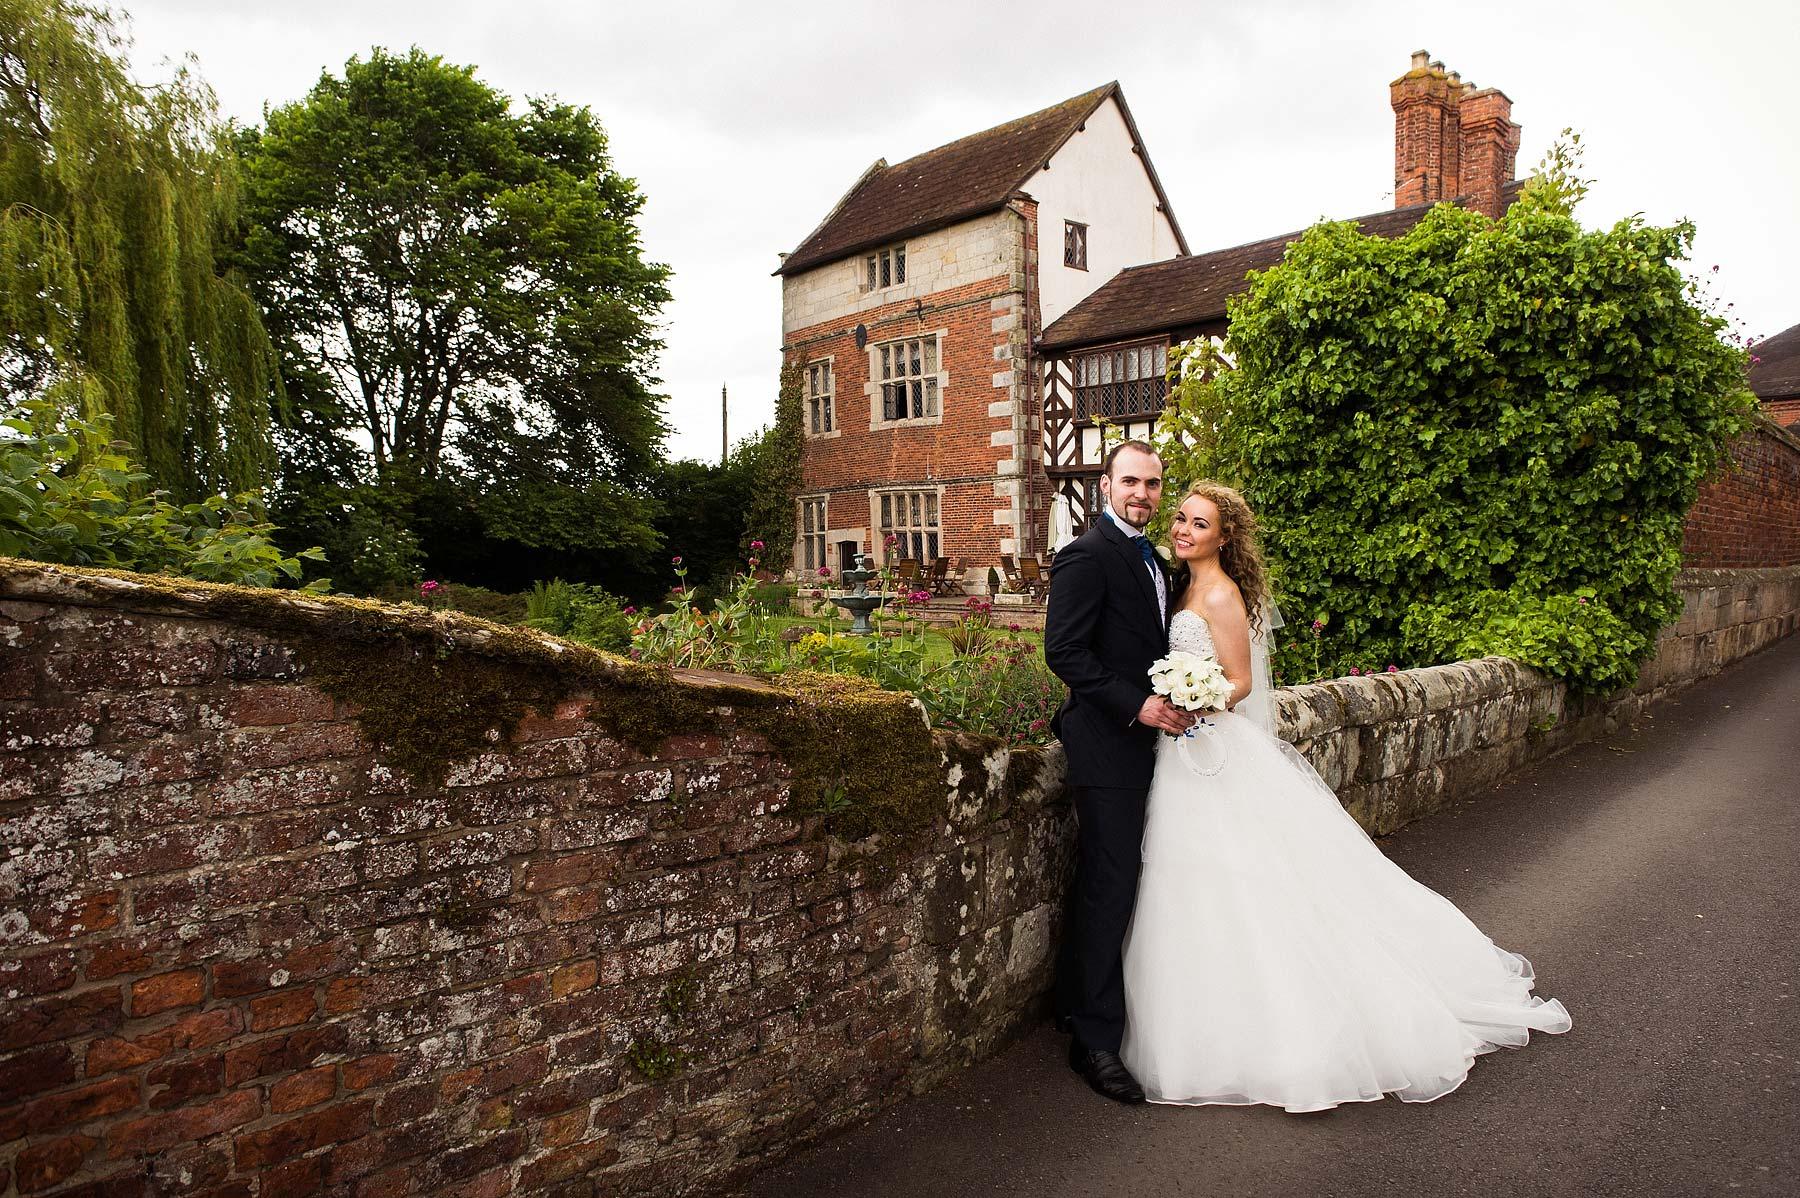 albright-hussey-manor-wedding-photographers-046